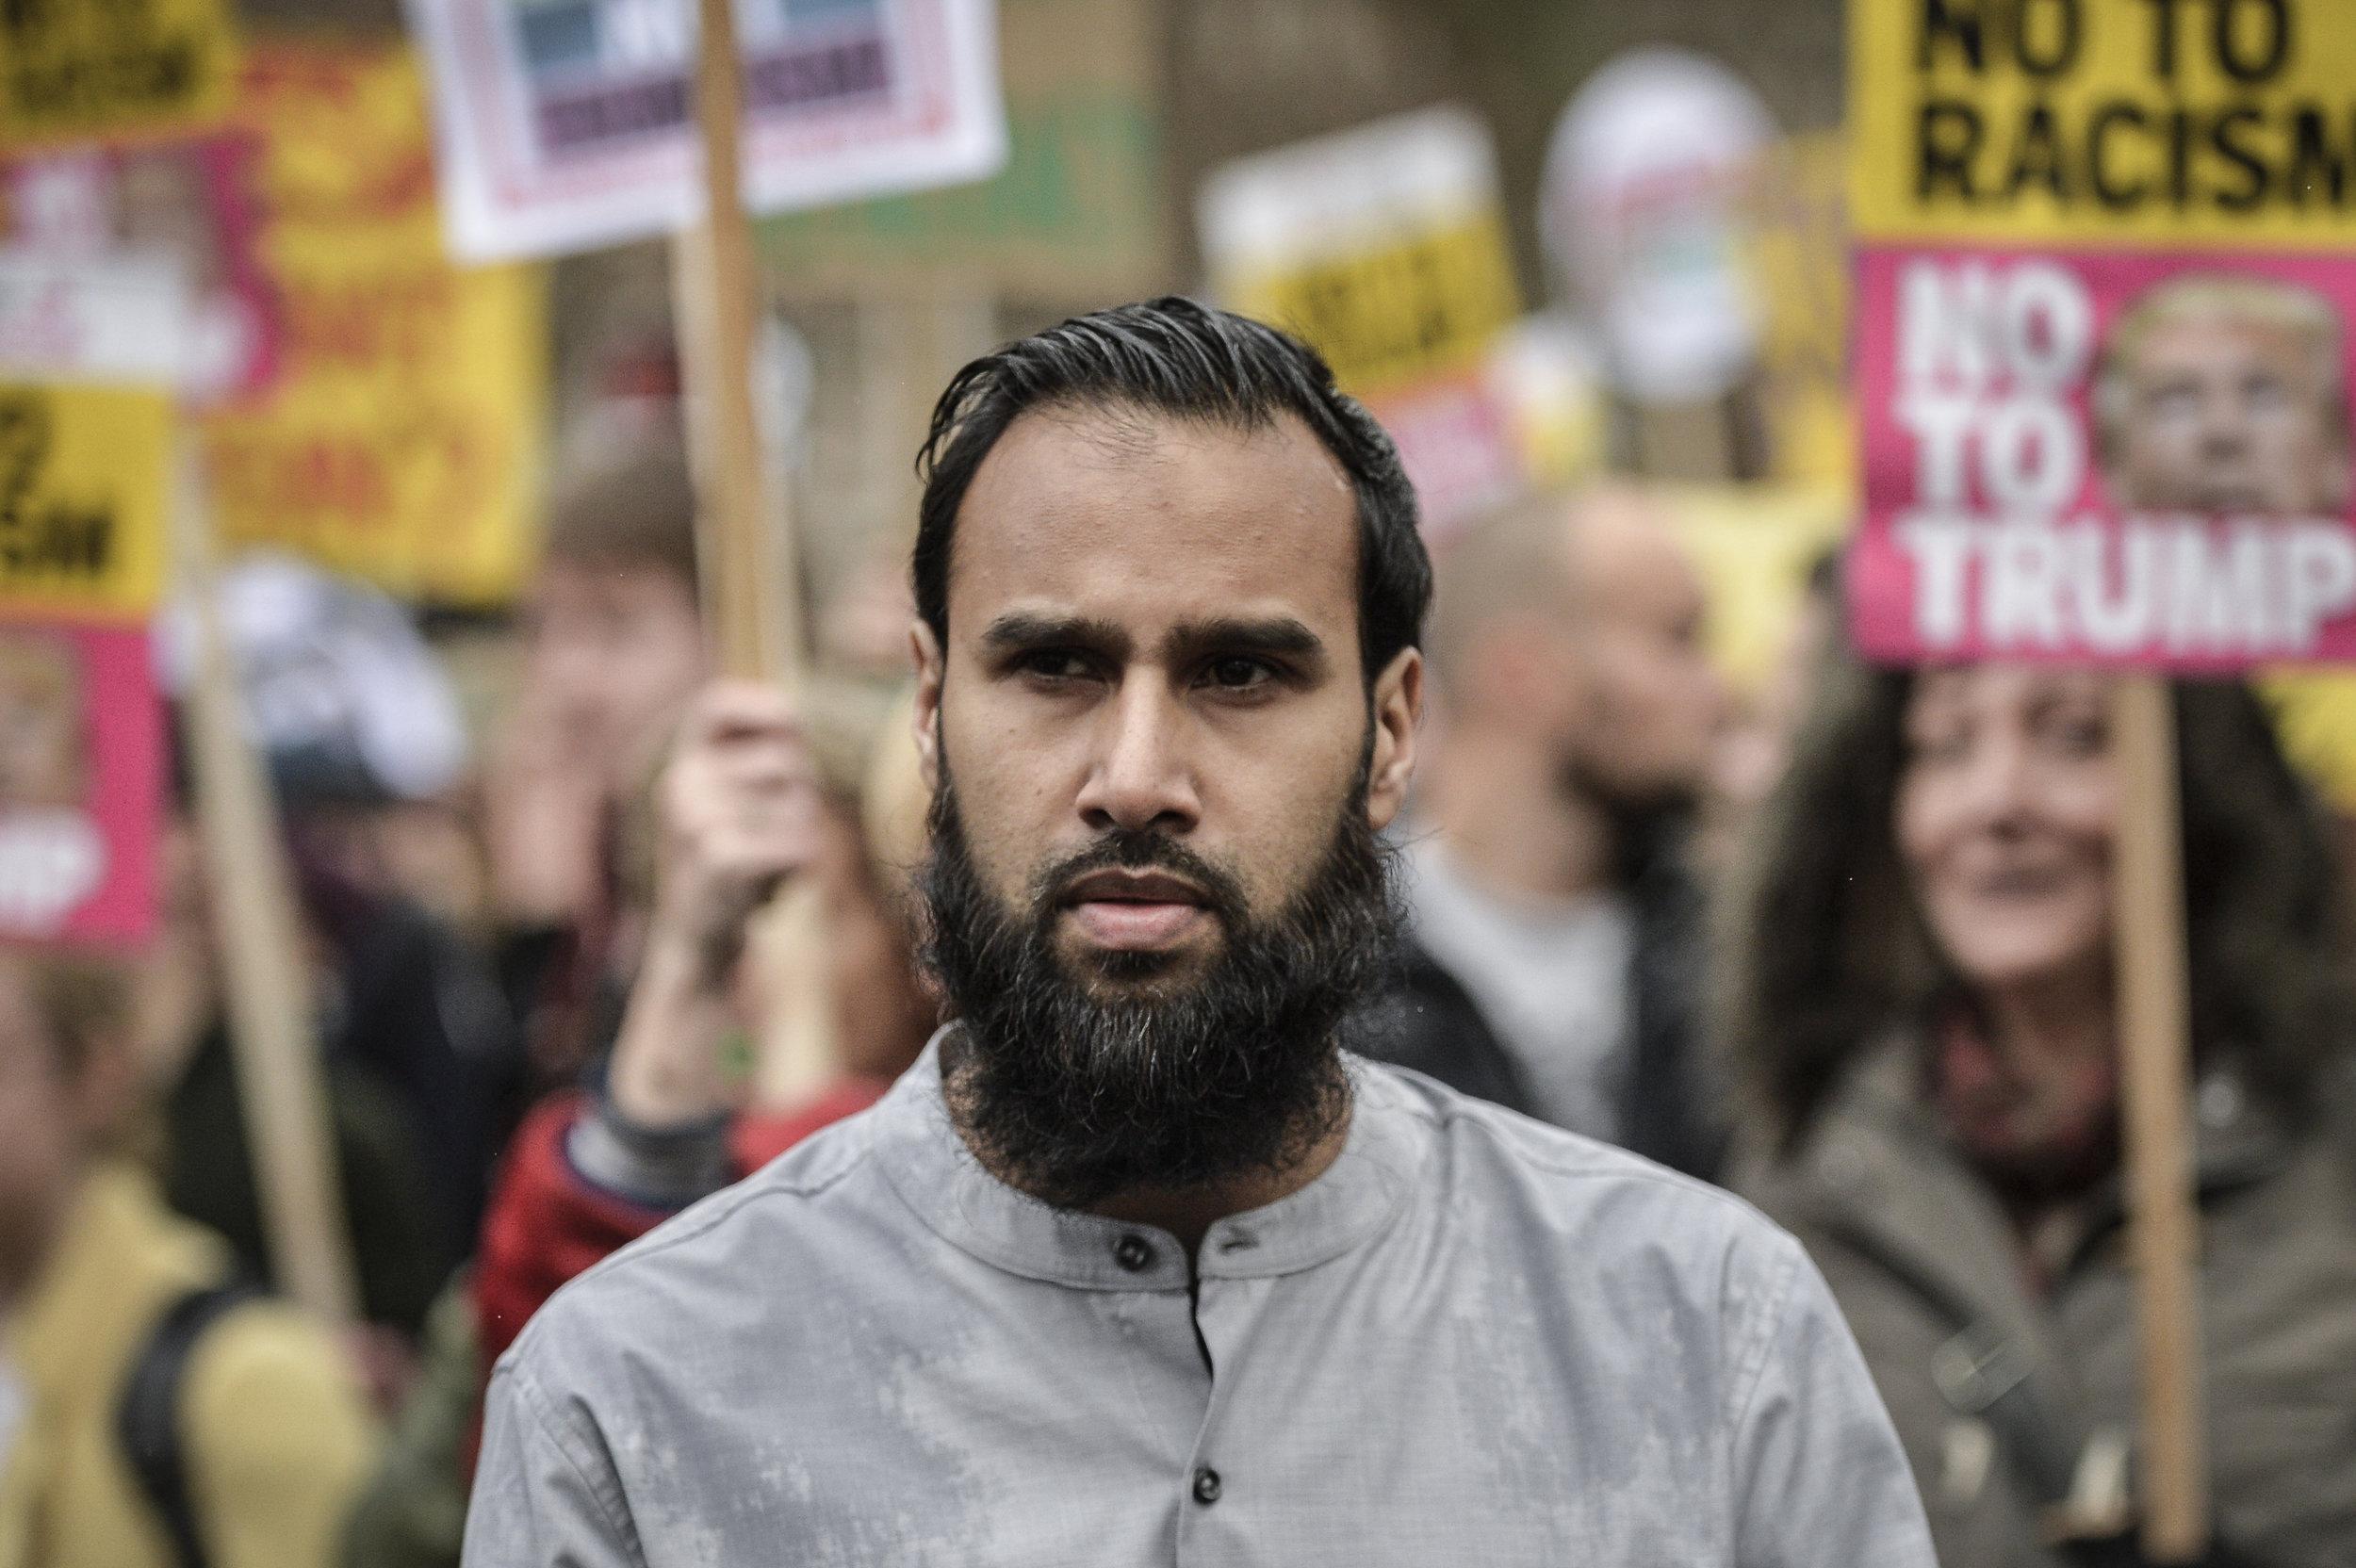 Muslim Ban Protest 040217-9.jpg